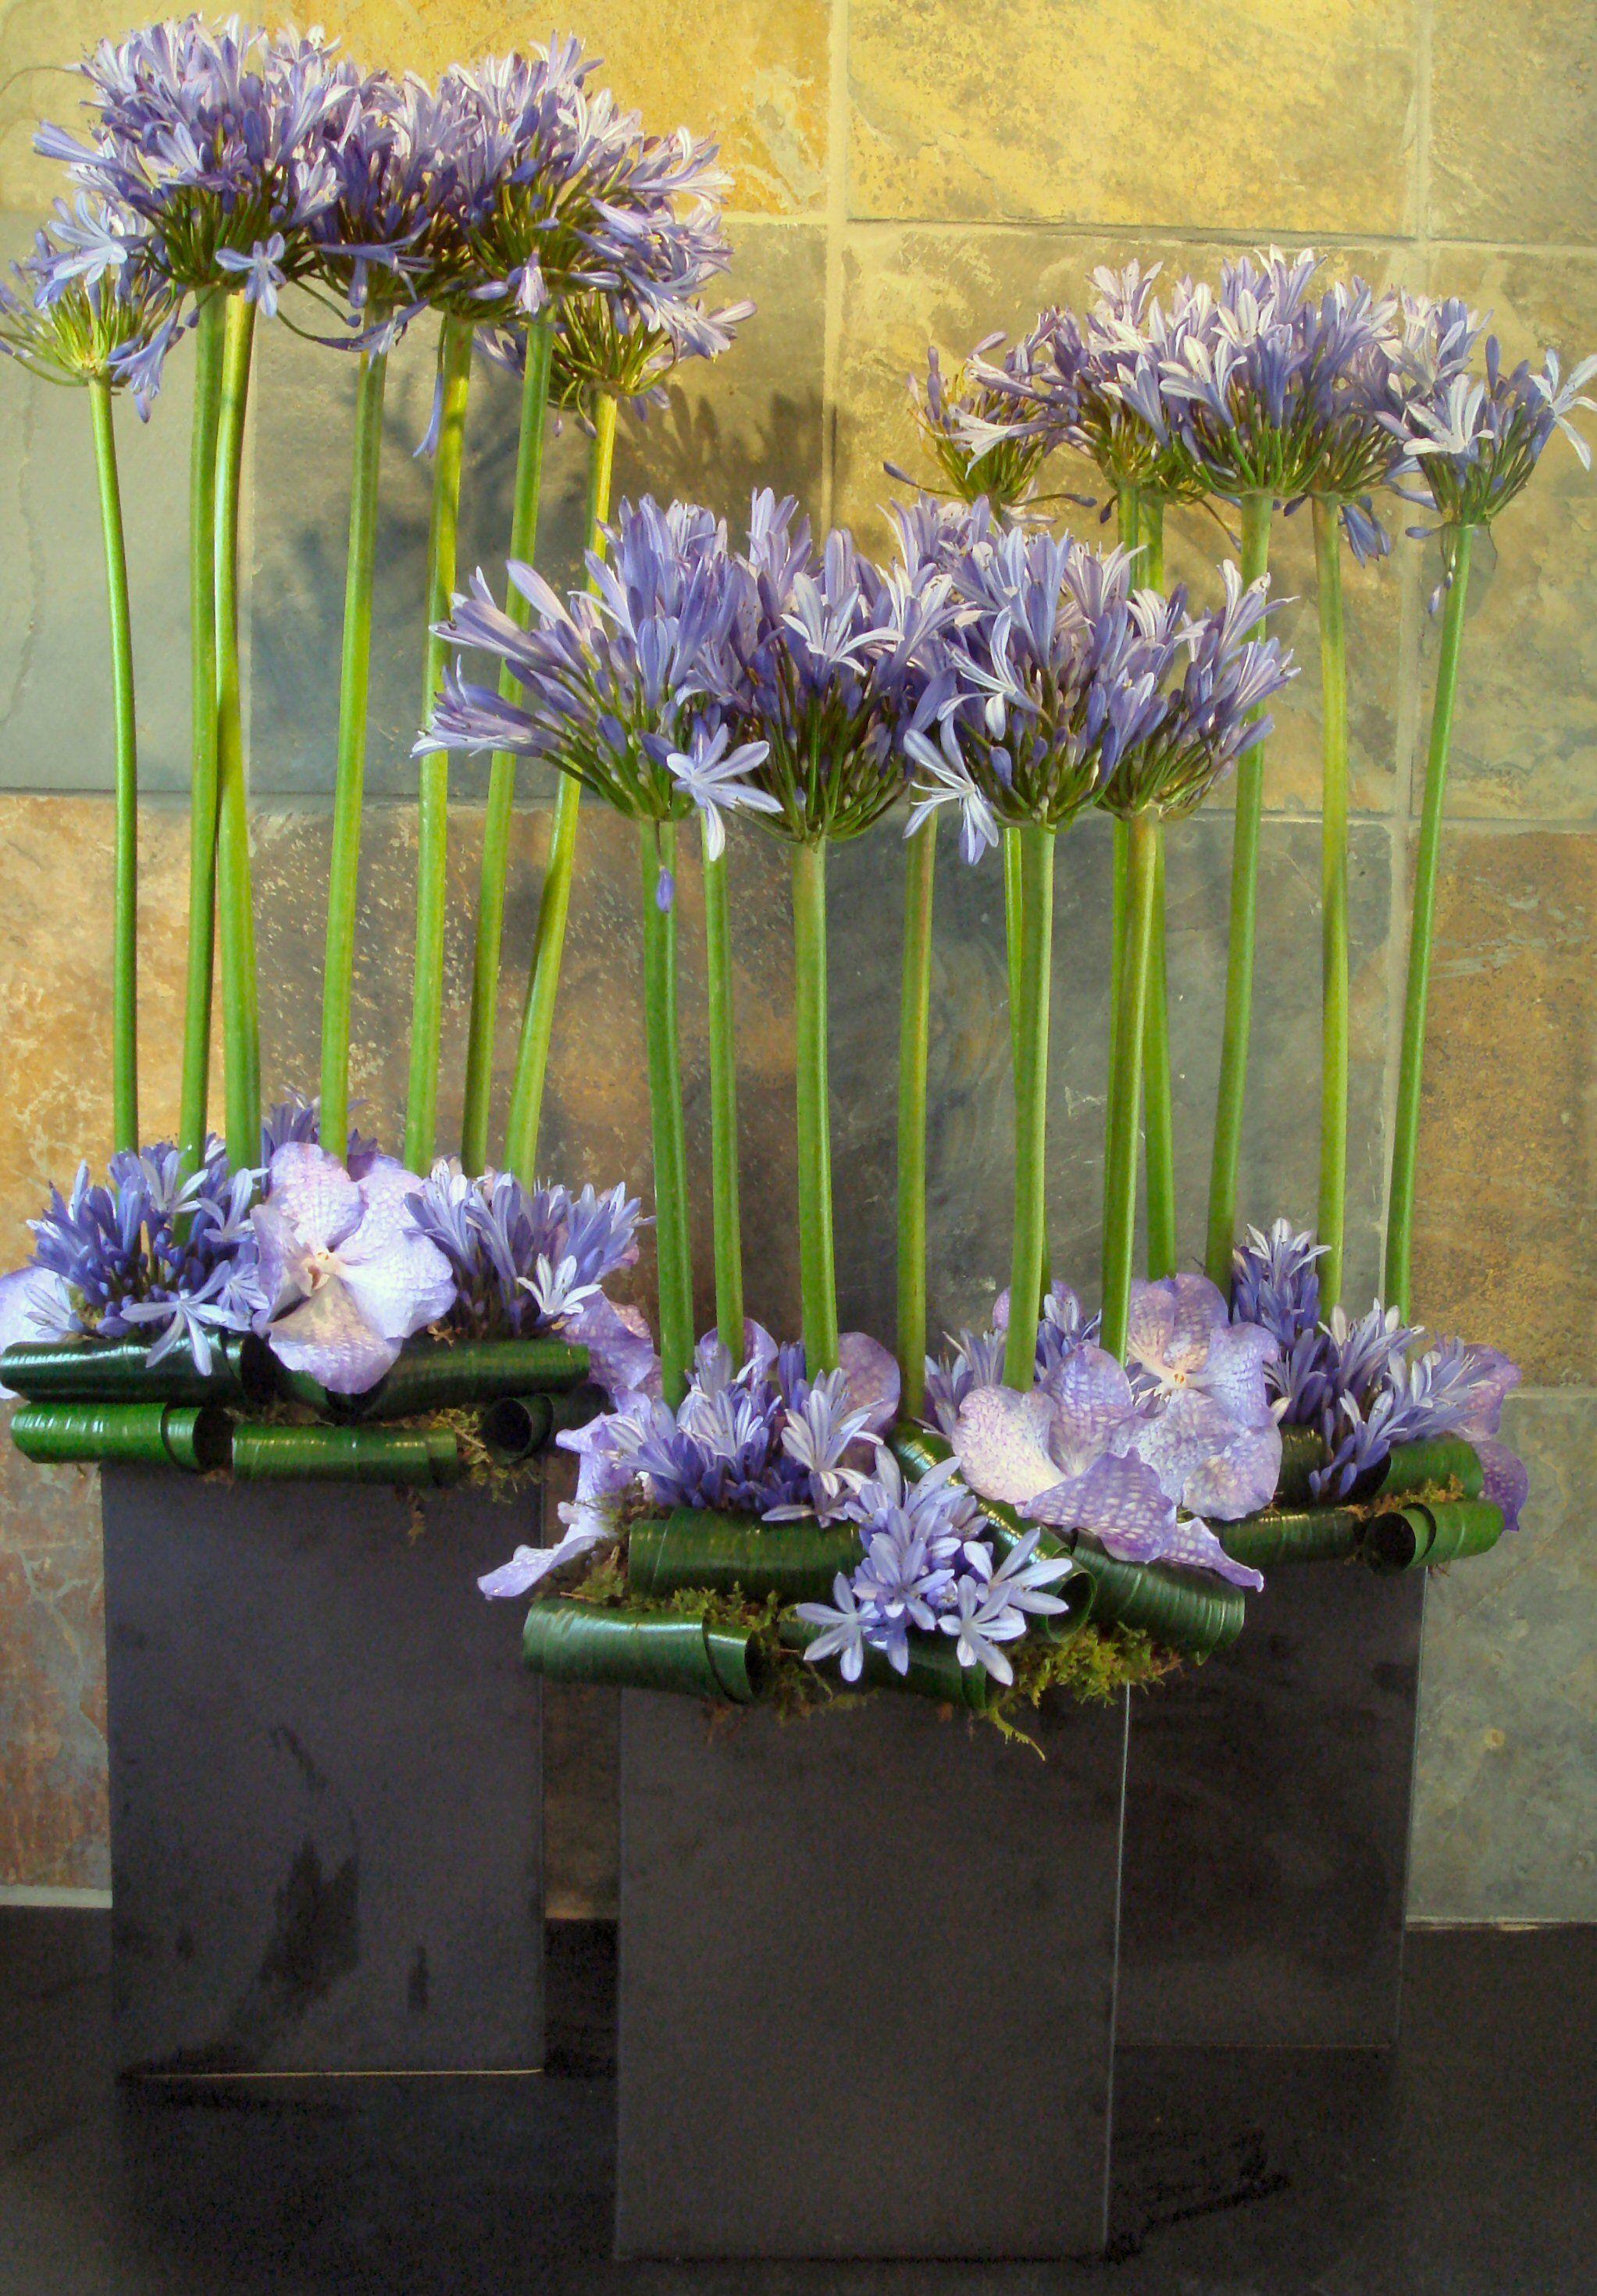 Lavender Modern Flower Arrangement Featuring Vanda Orchids And Allium For A Hotel Lobby Modern Flower Arrangements Hotel Flowers Church Flower Arrangements